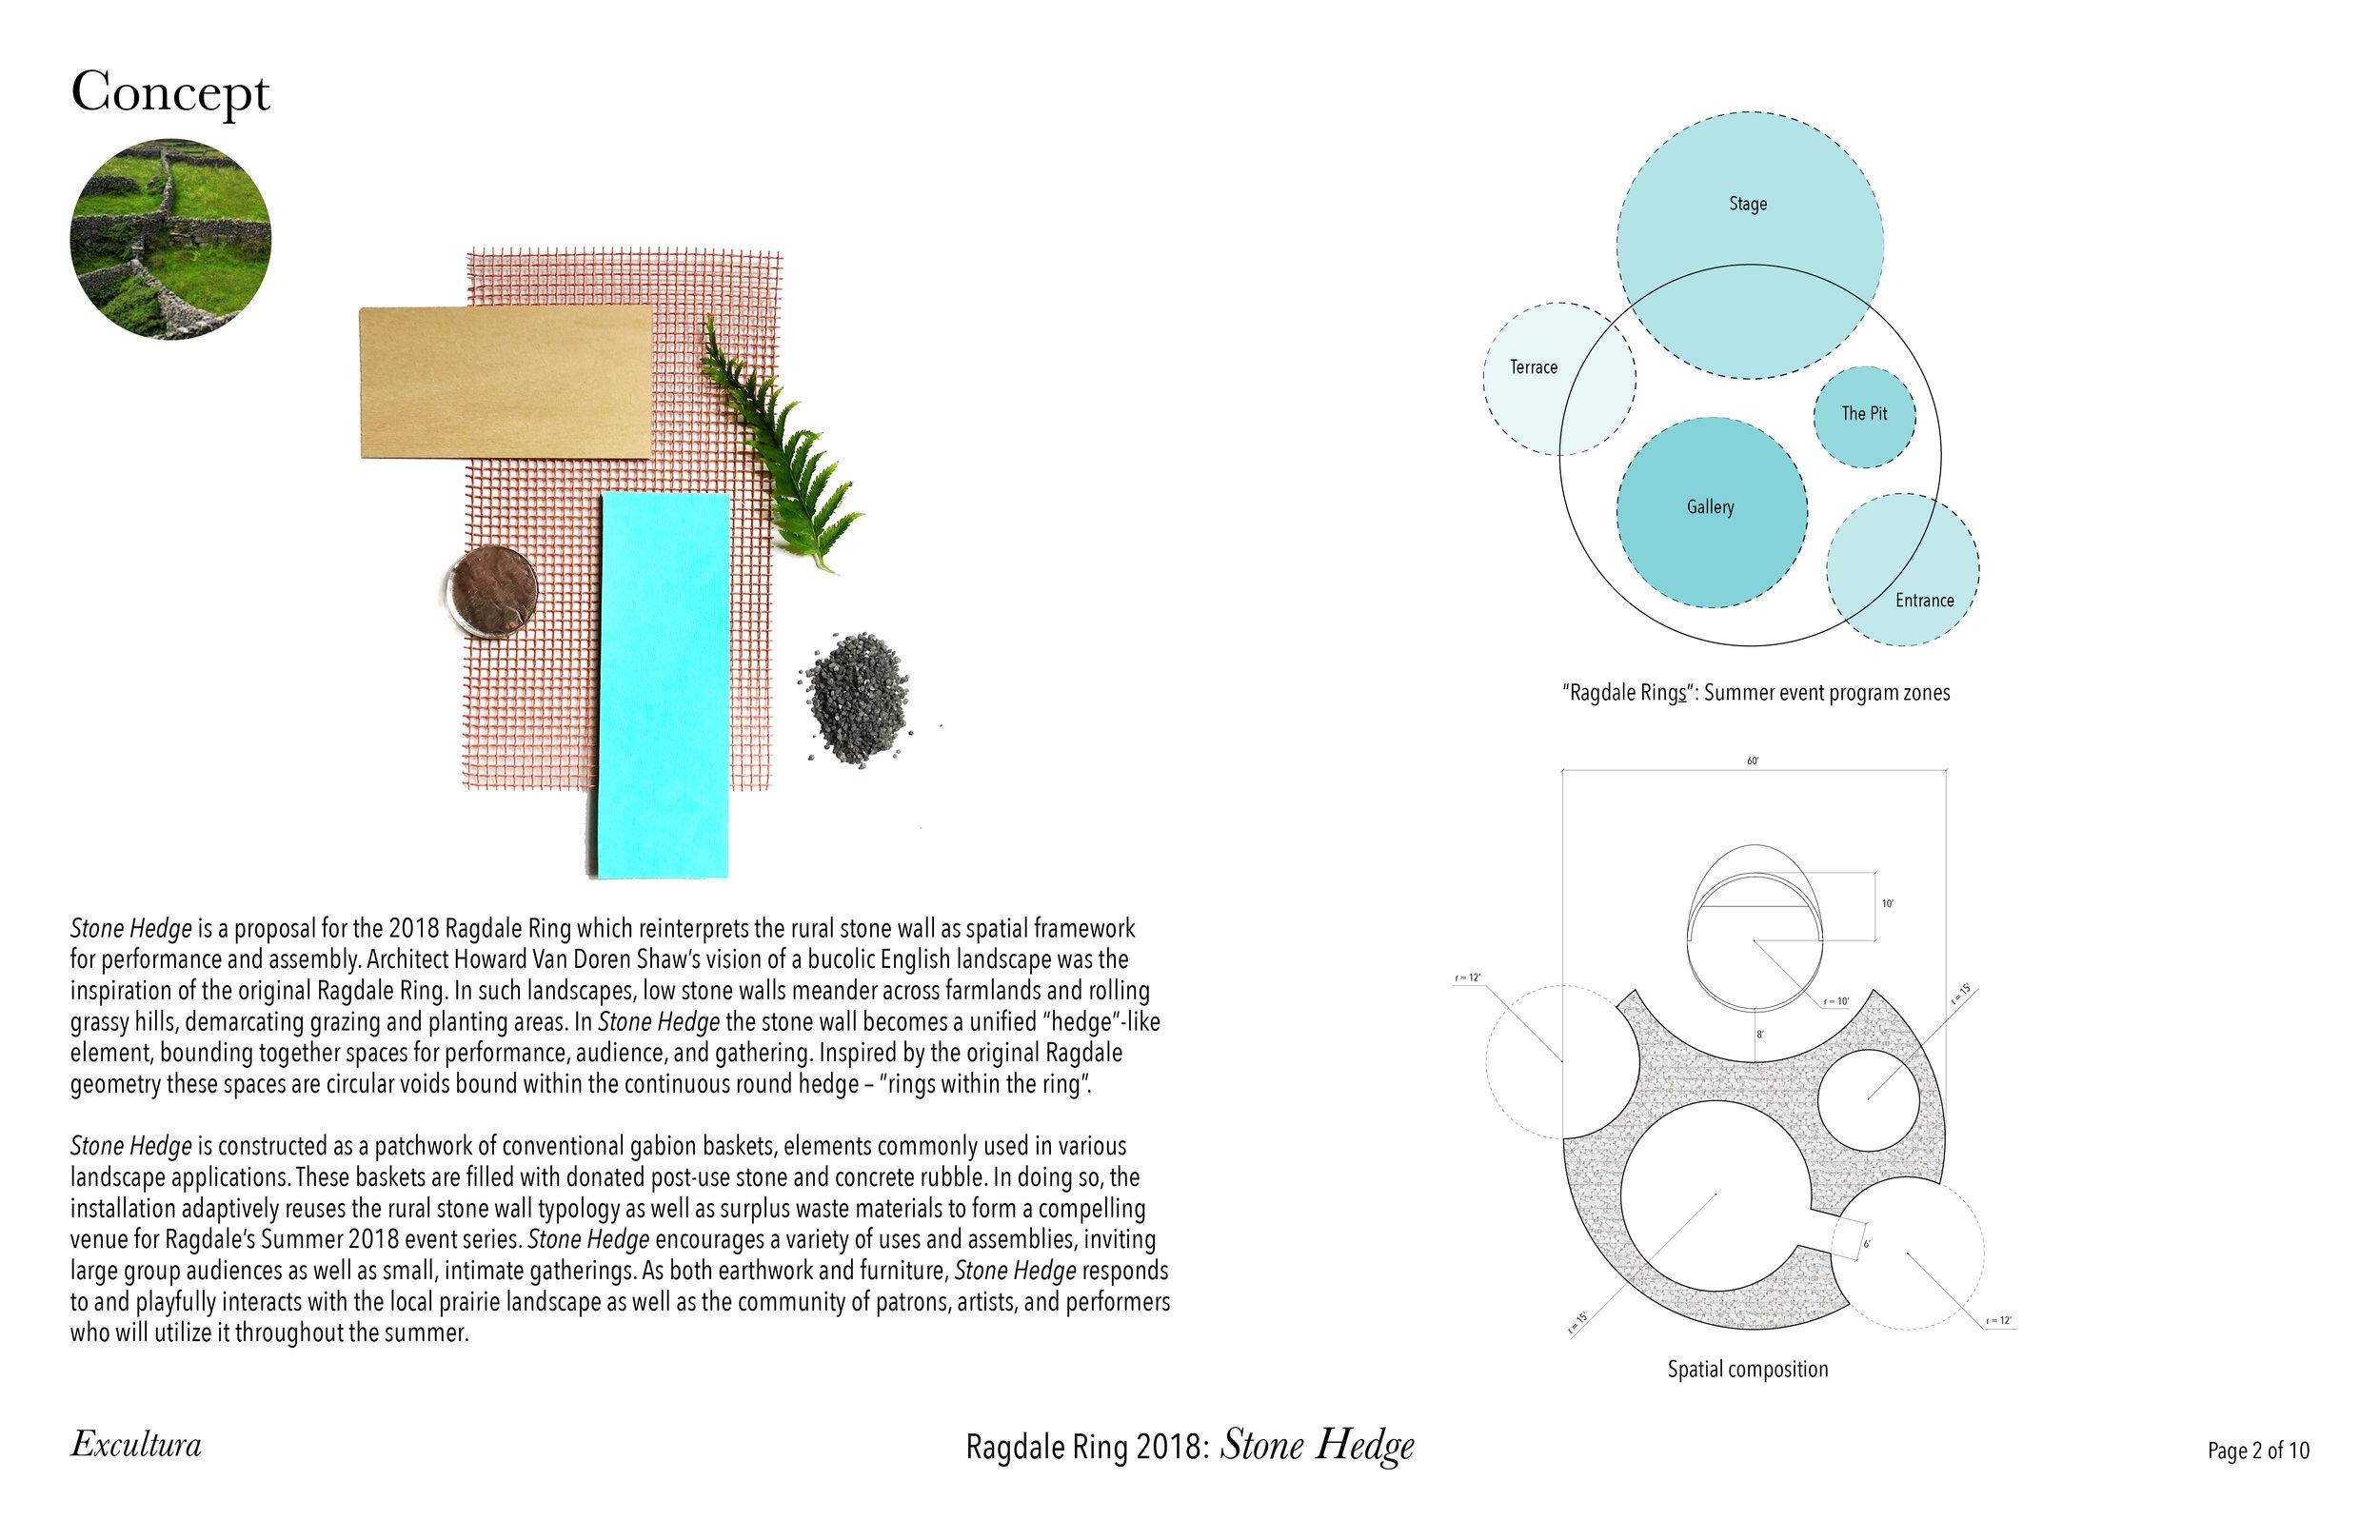 Excultura_Visual_Proposal2.jpg